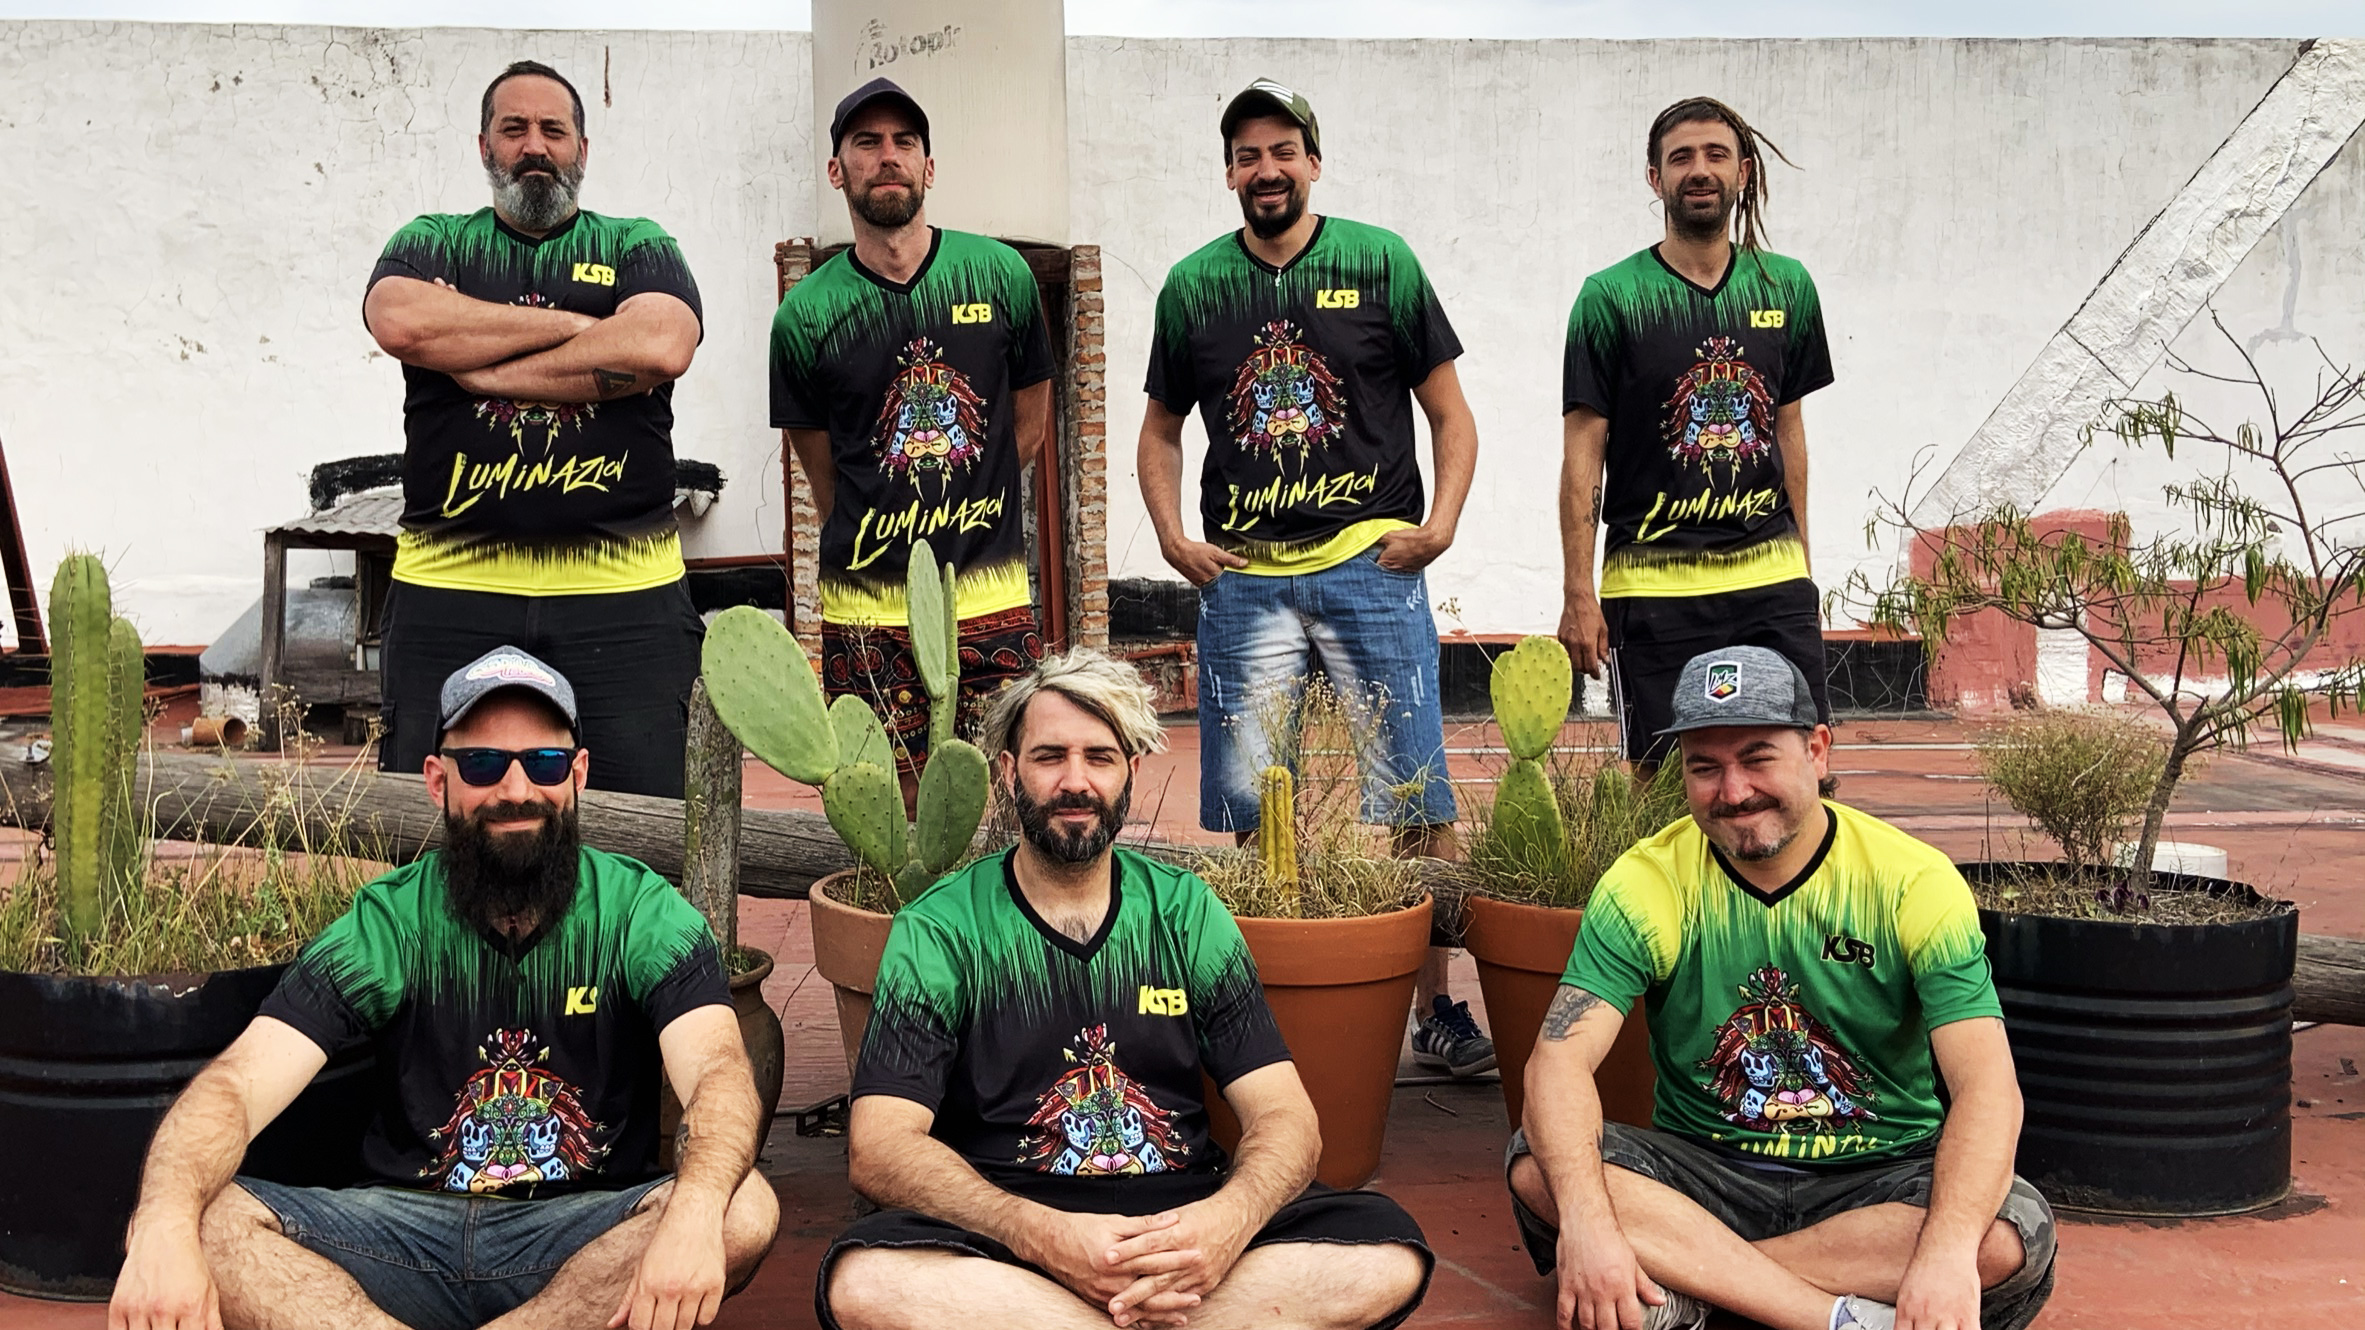 Luminazion celebra por streaming sus 10 años de música